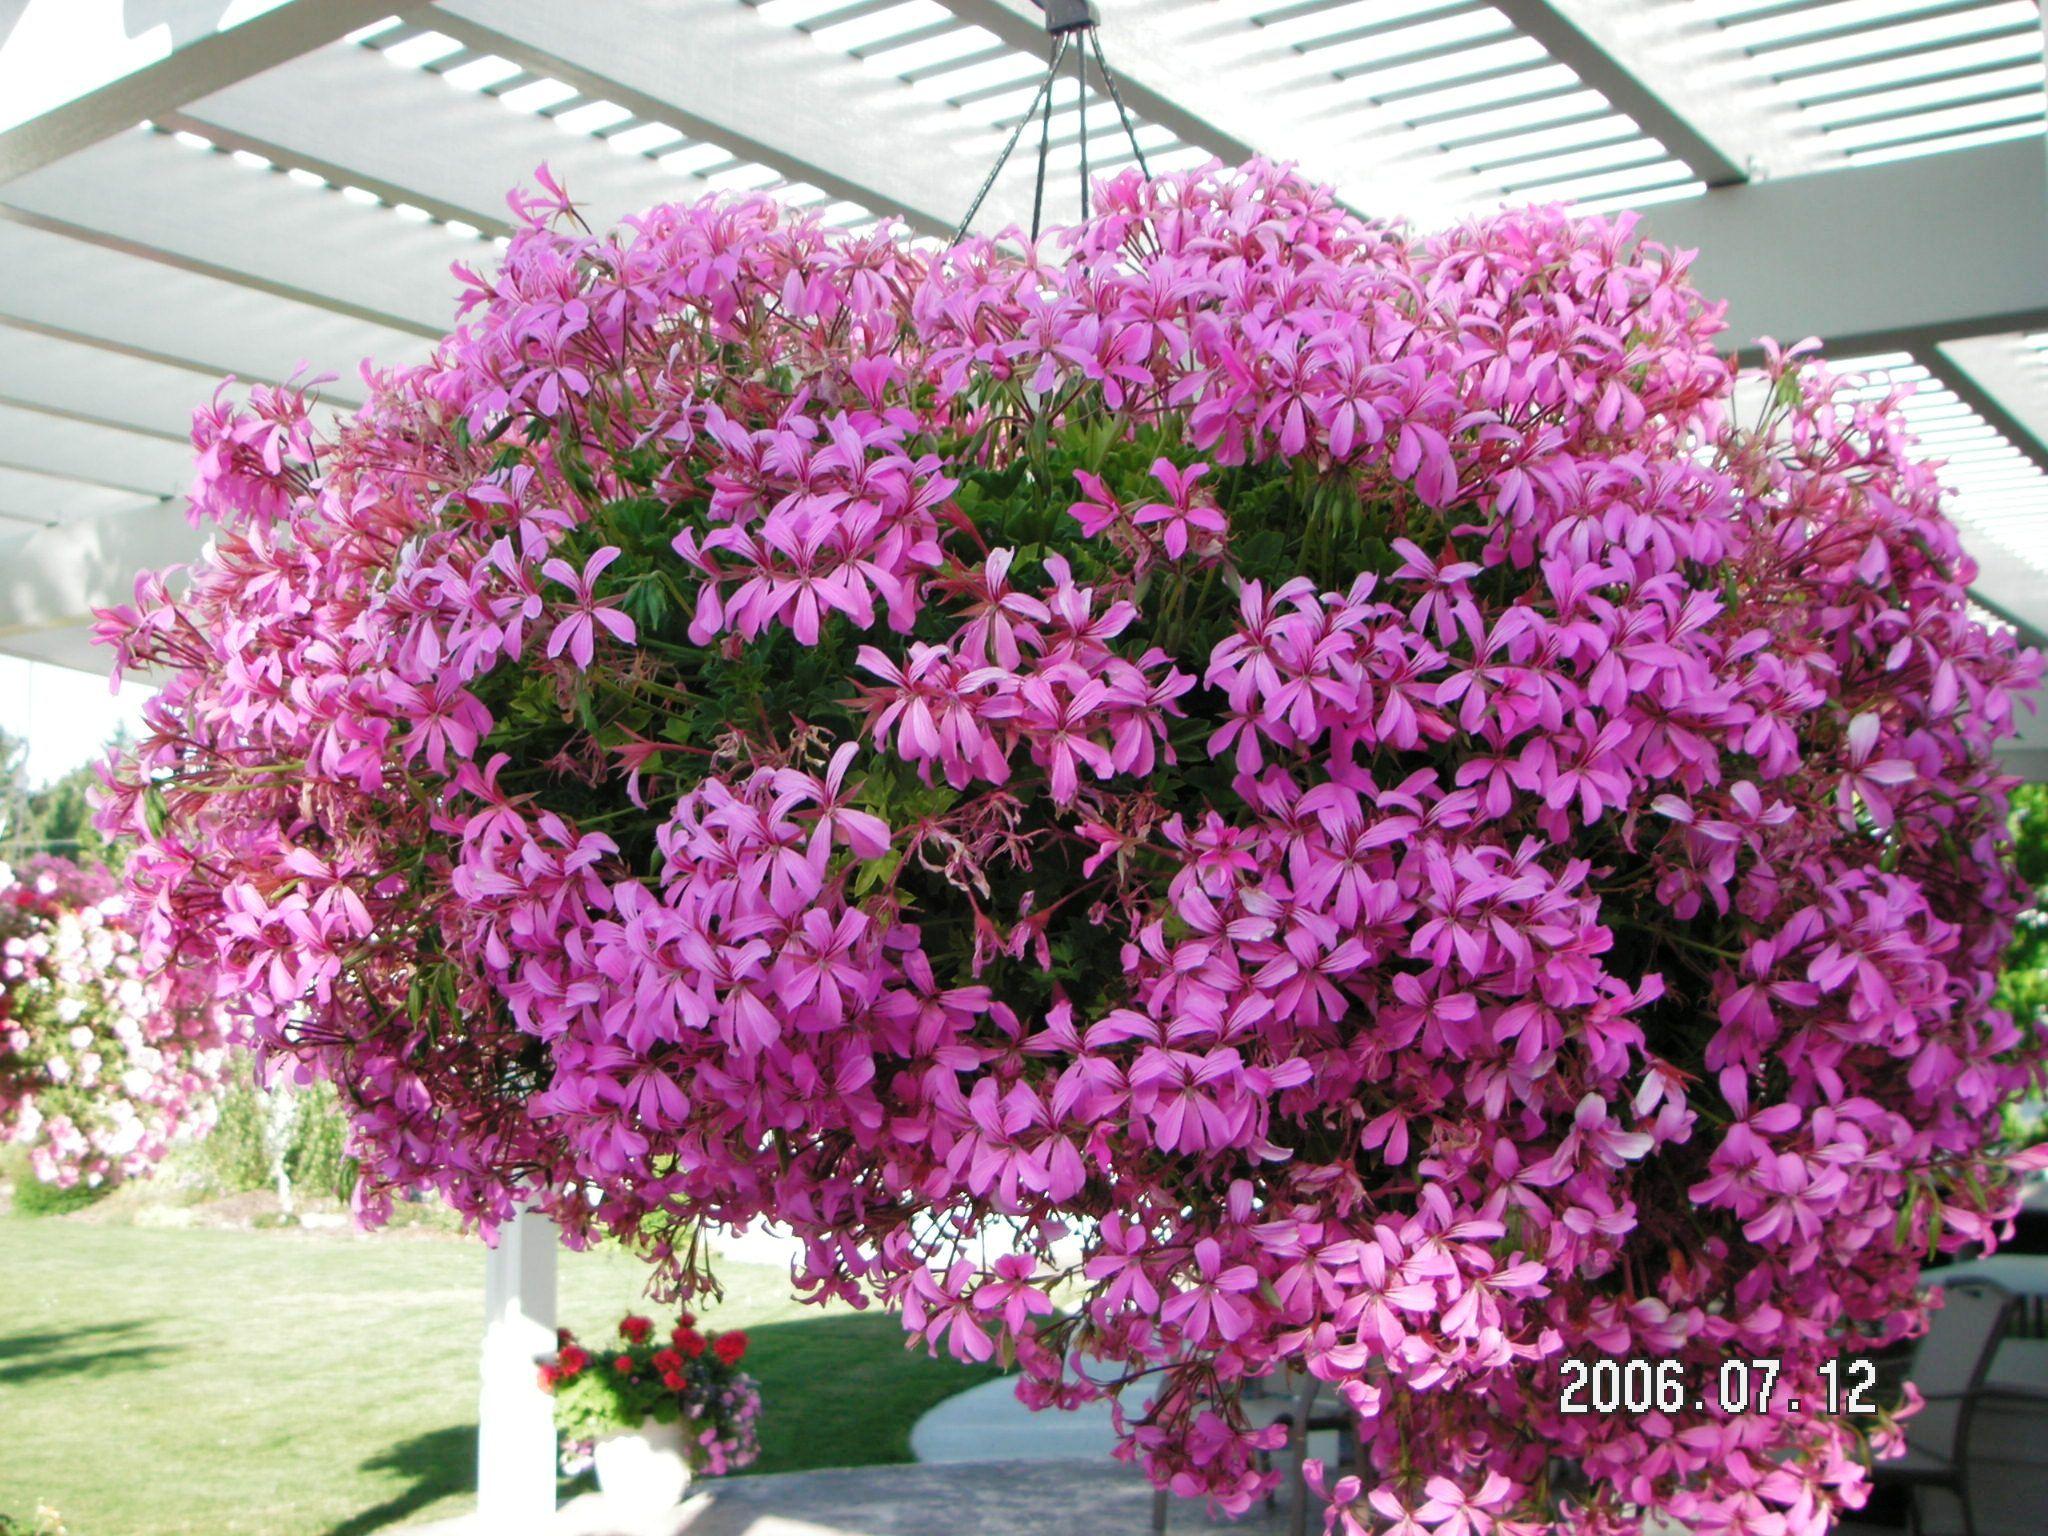 Flower Varieties For Hanging Baskets : Geranium varieties short history of the